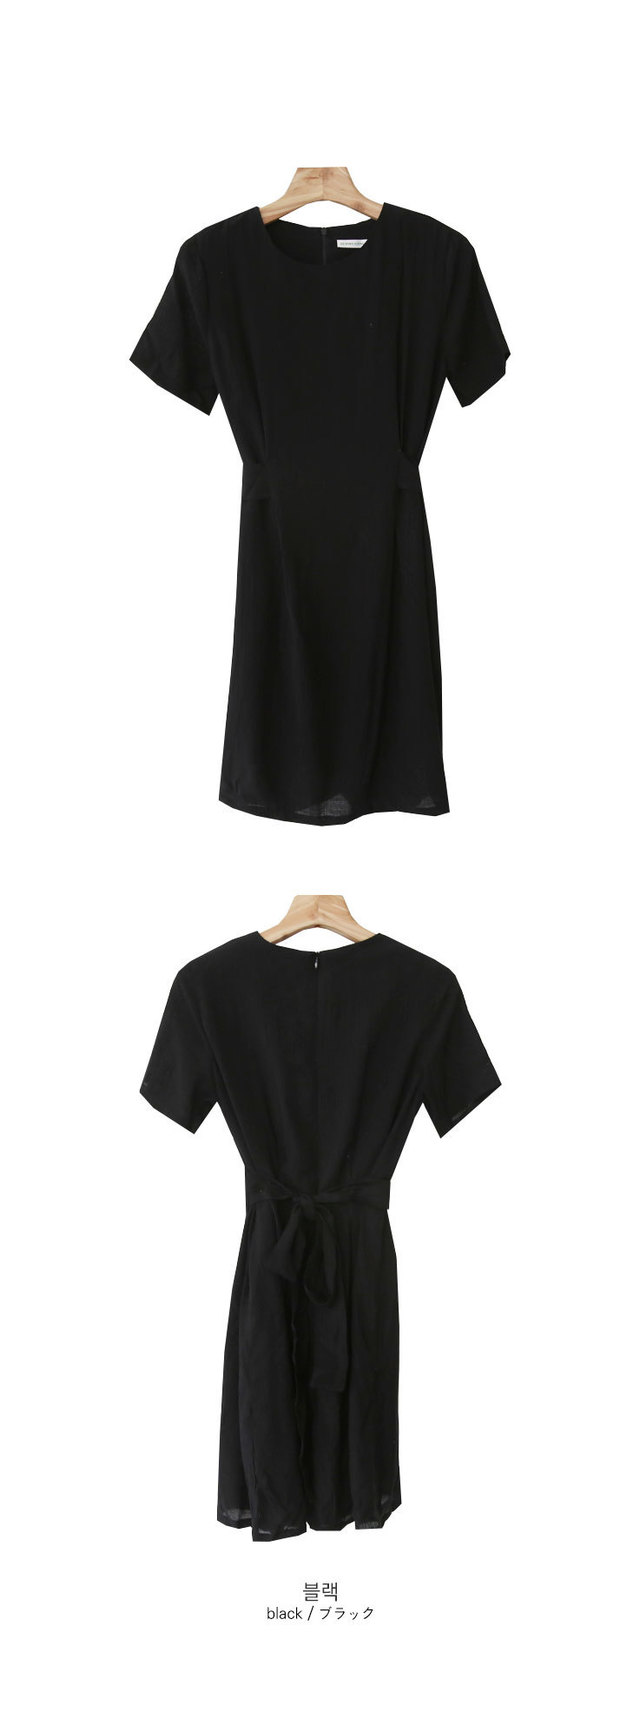 Self made / Dearblack - 2kg black dress